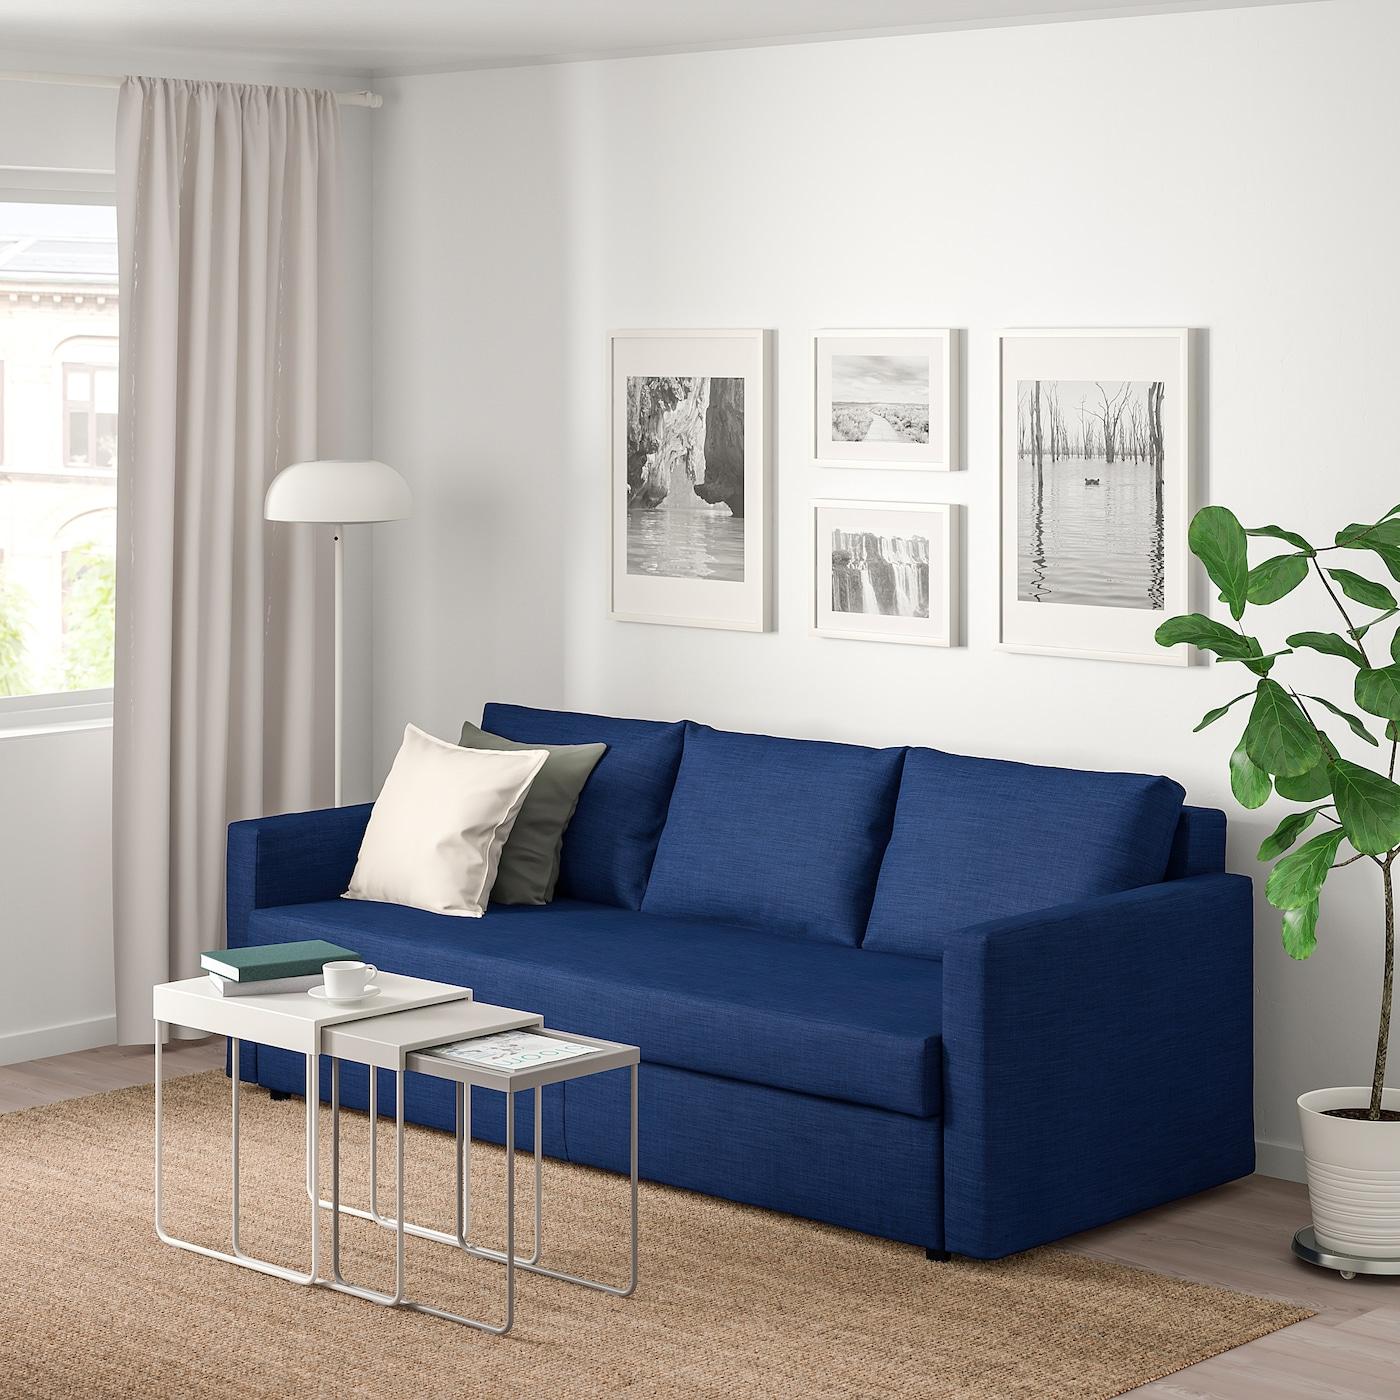 Slaapbank Ikea Karlstad.Friheten 3 Seat Sofa Bed Hyllie Dark Grey Ikea